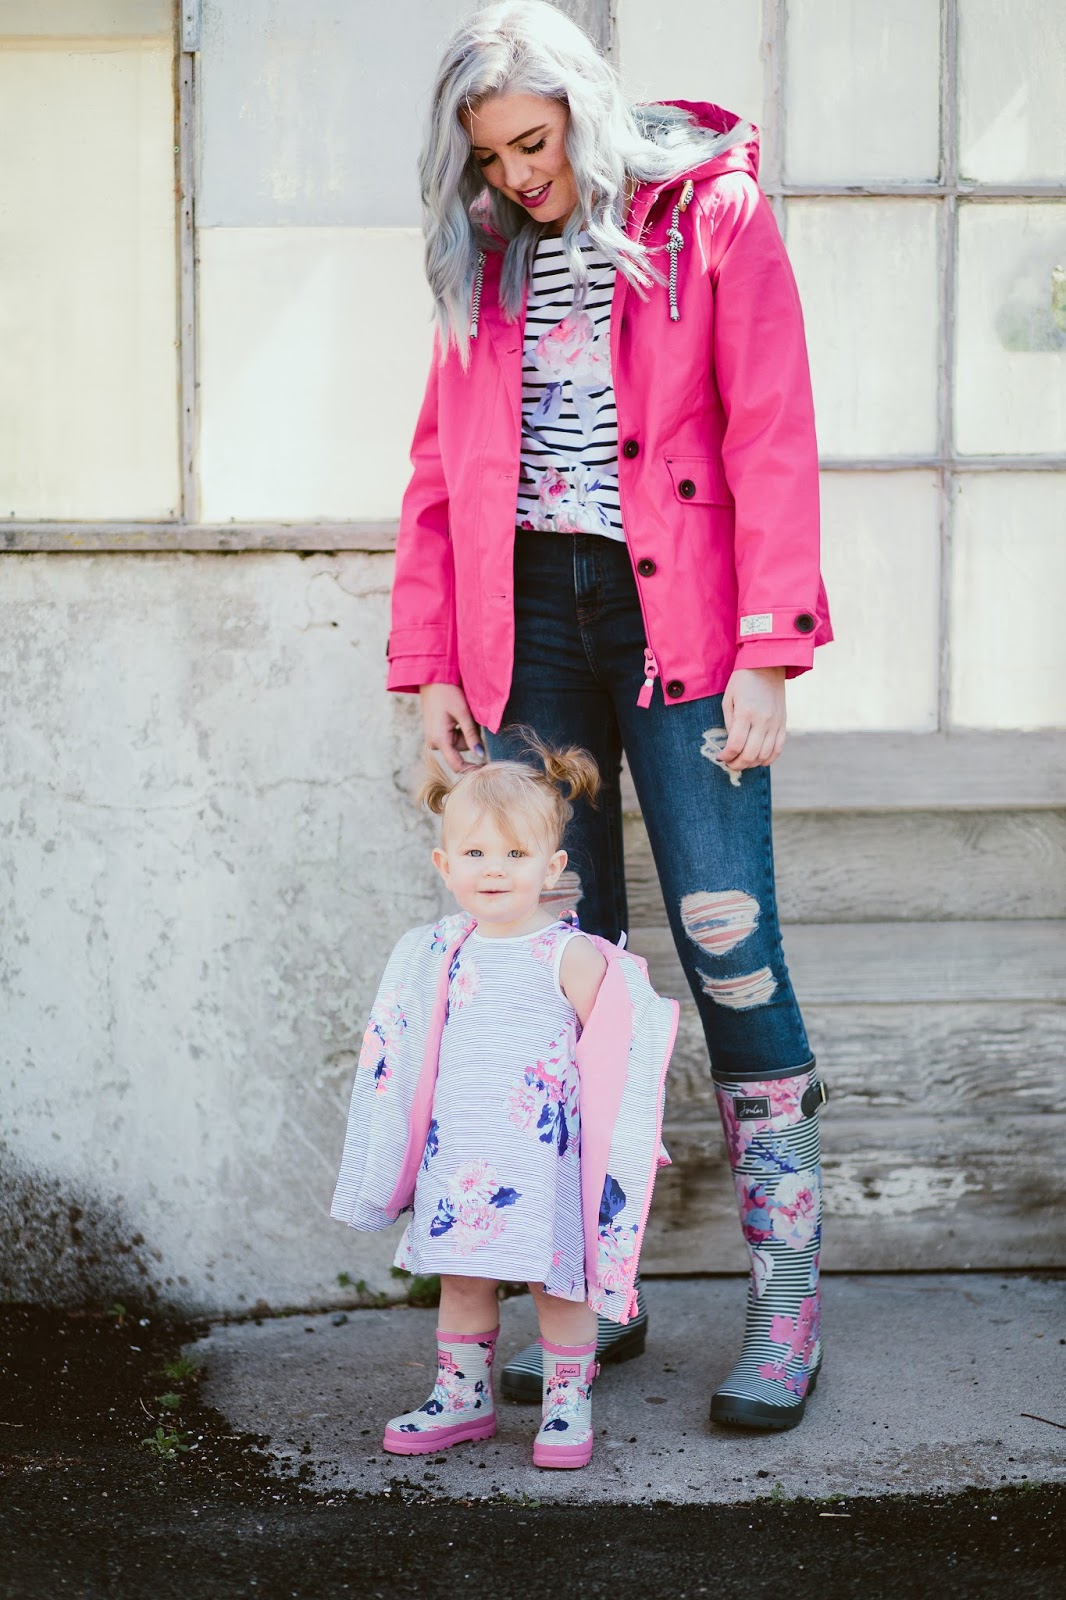 Printed Rain Boots, Pink Rain Jacket, Style Blogger